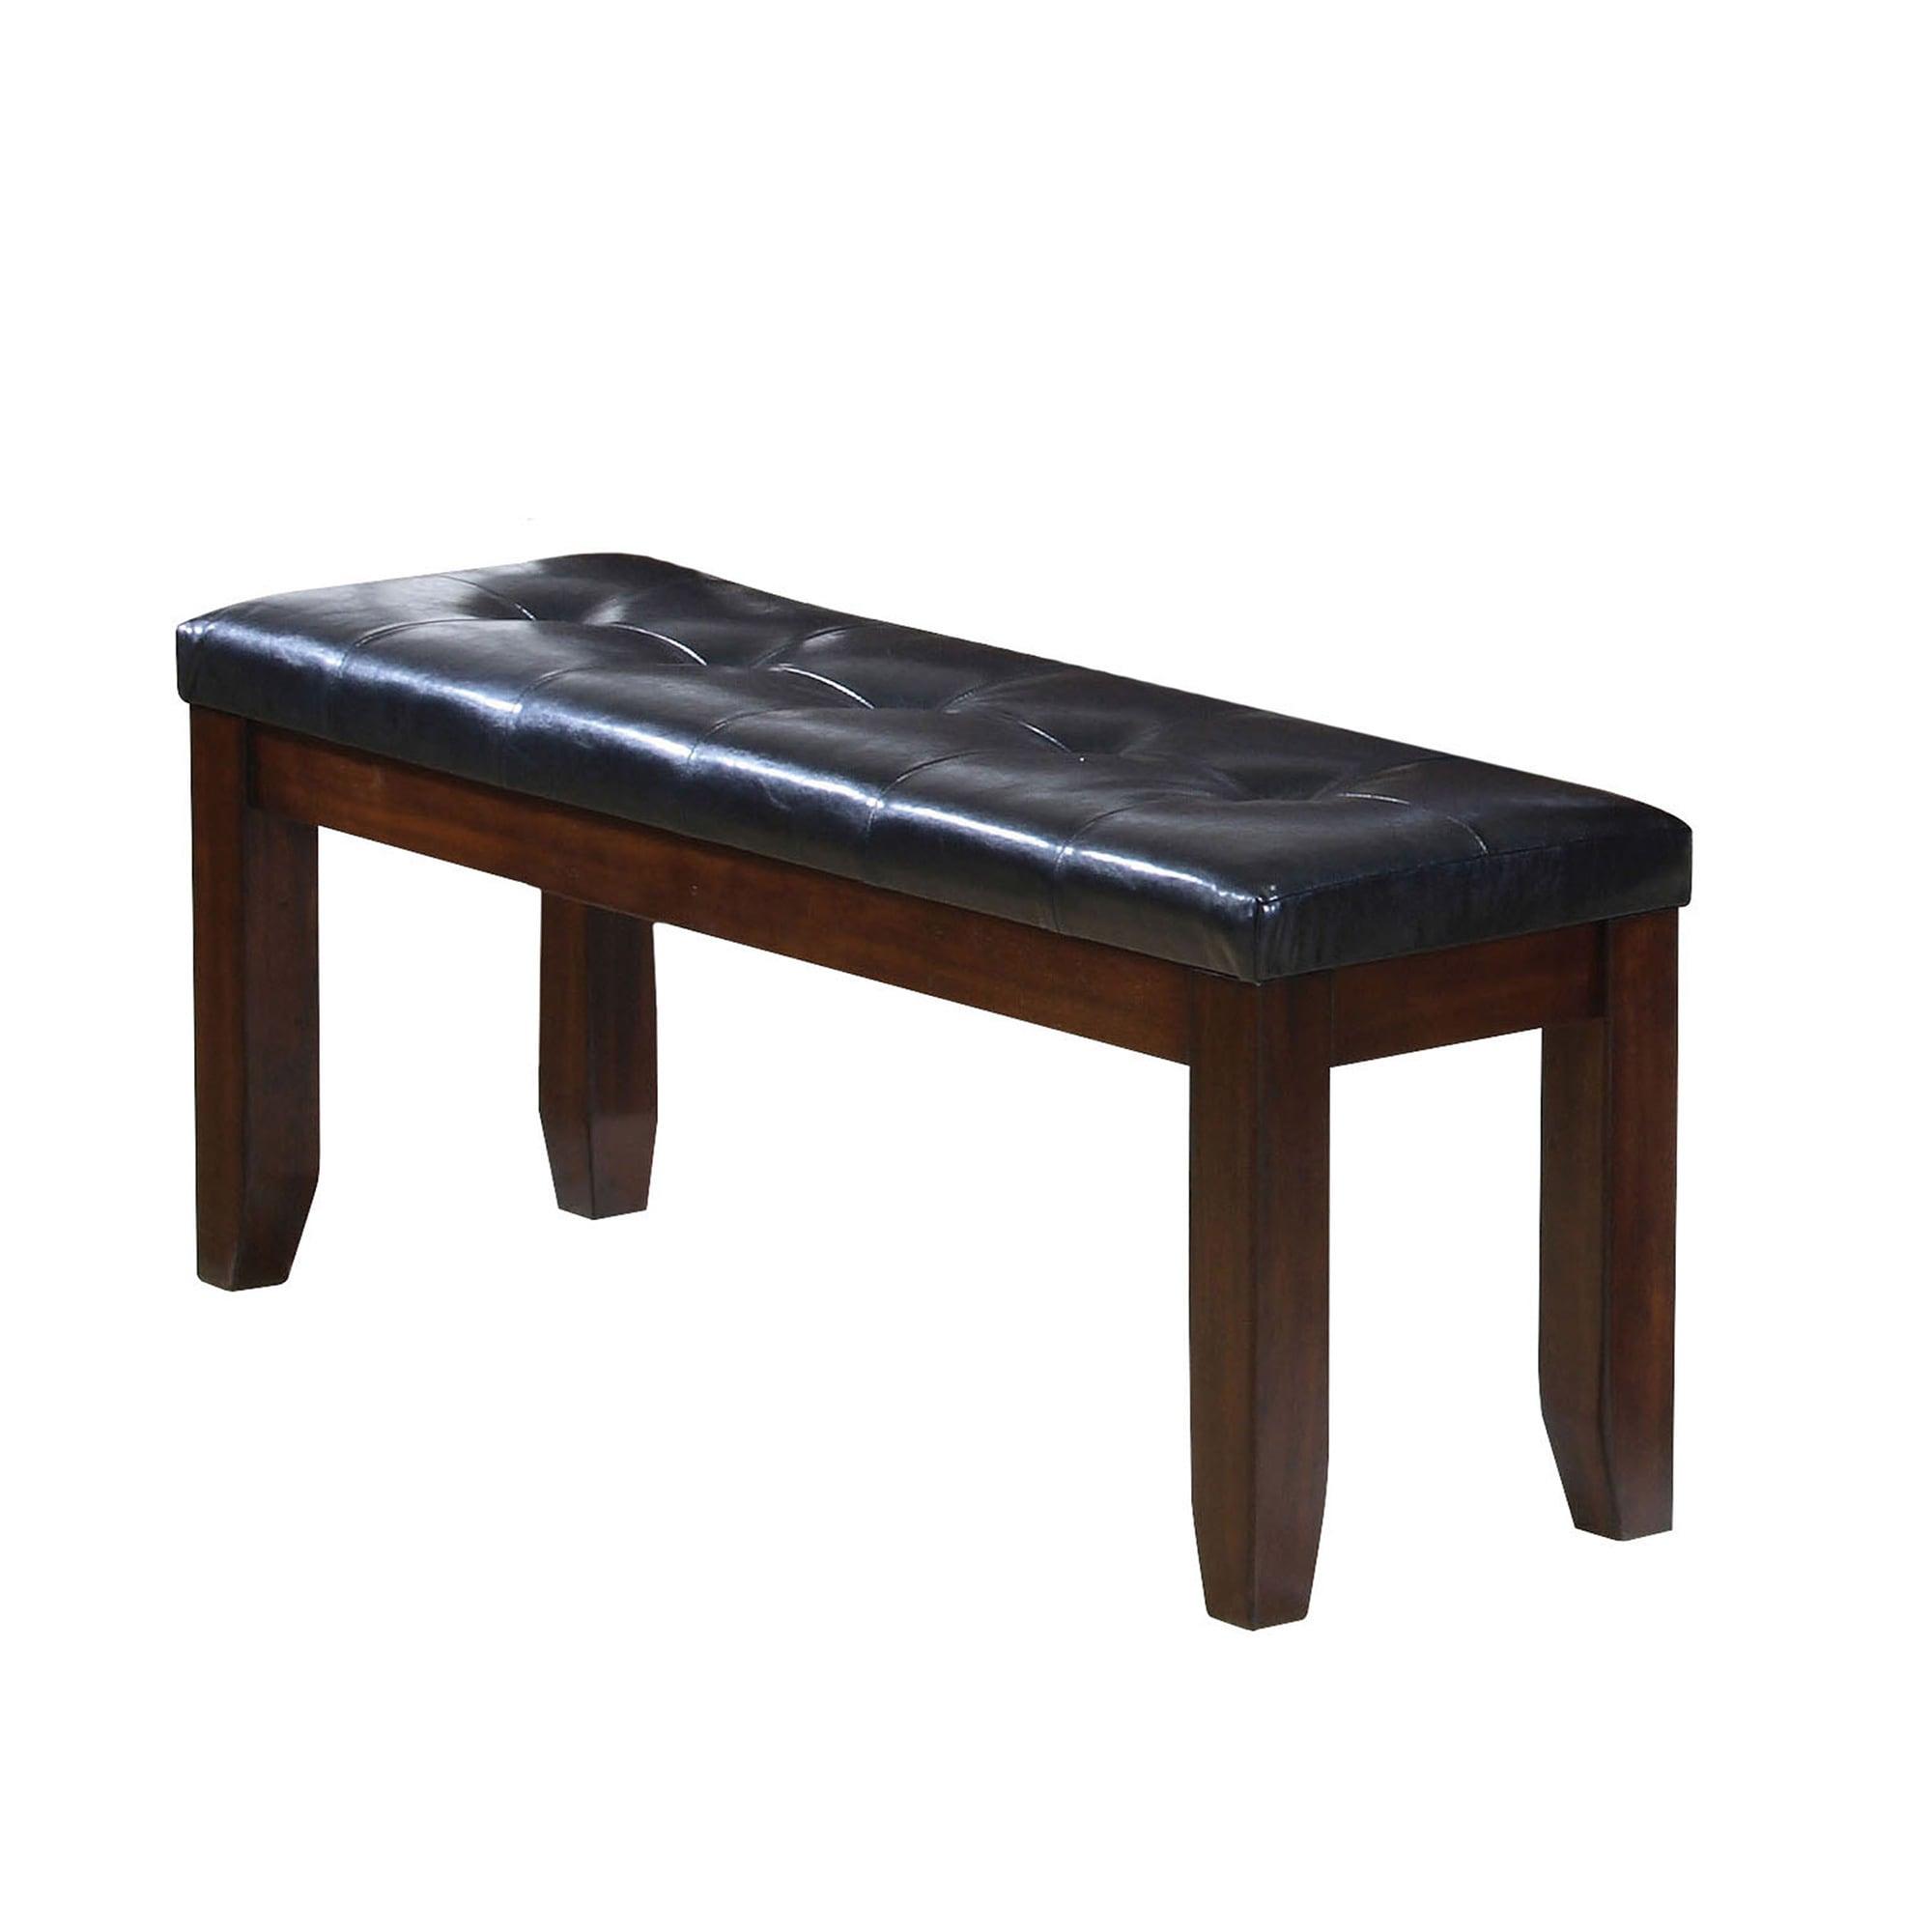 ACME Furniture Espresso Black PU Urbana Dining Bench (Ben.